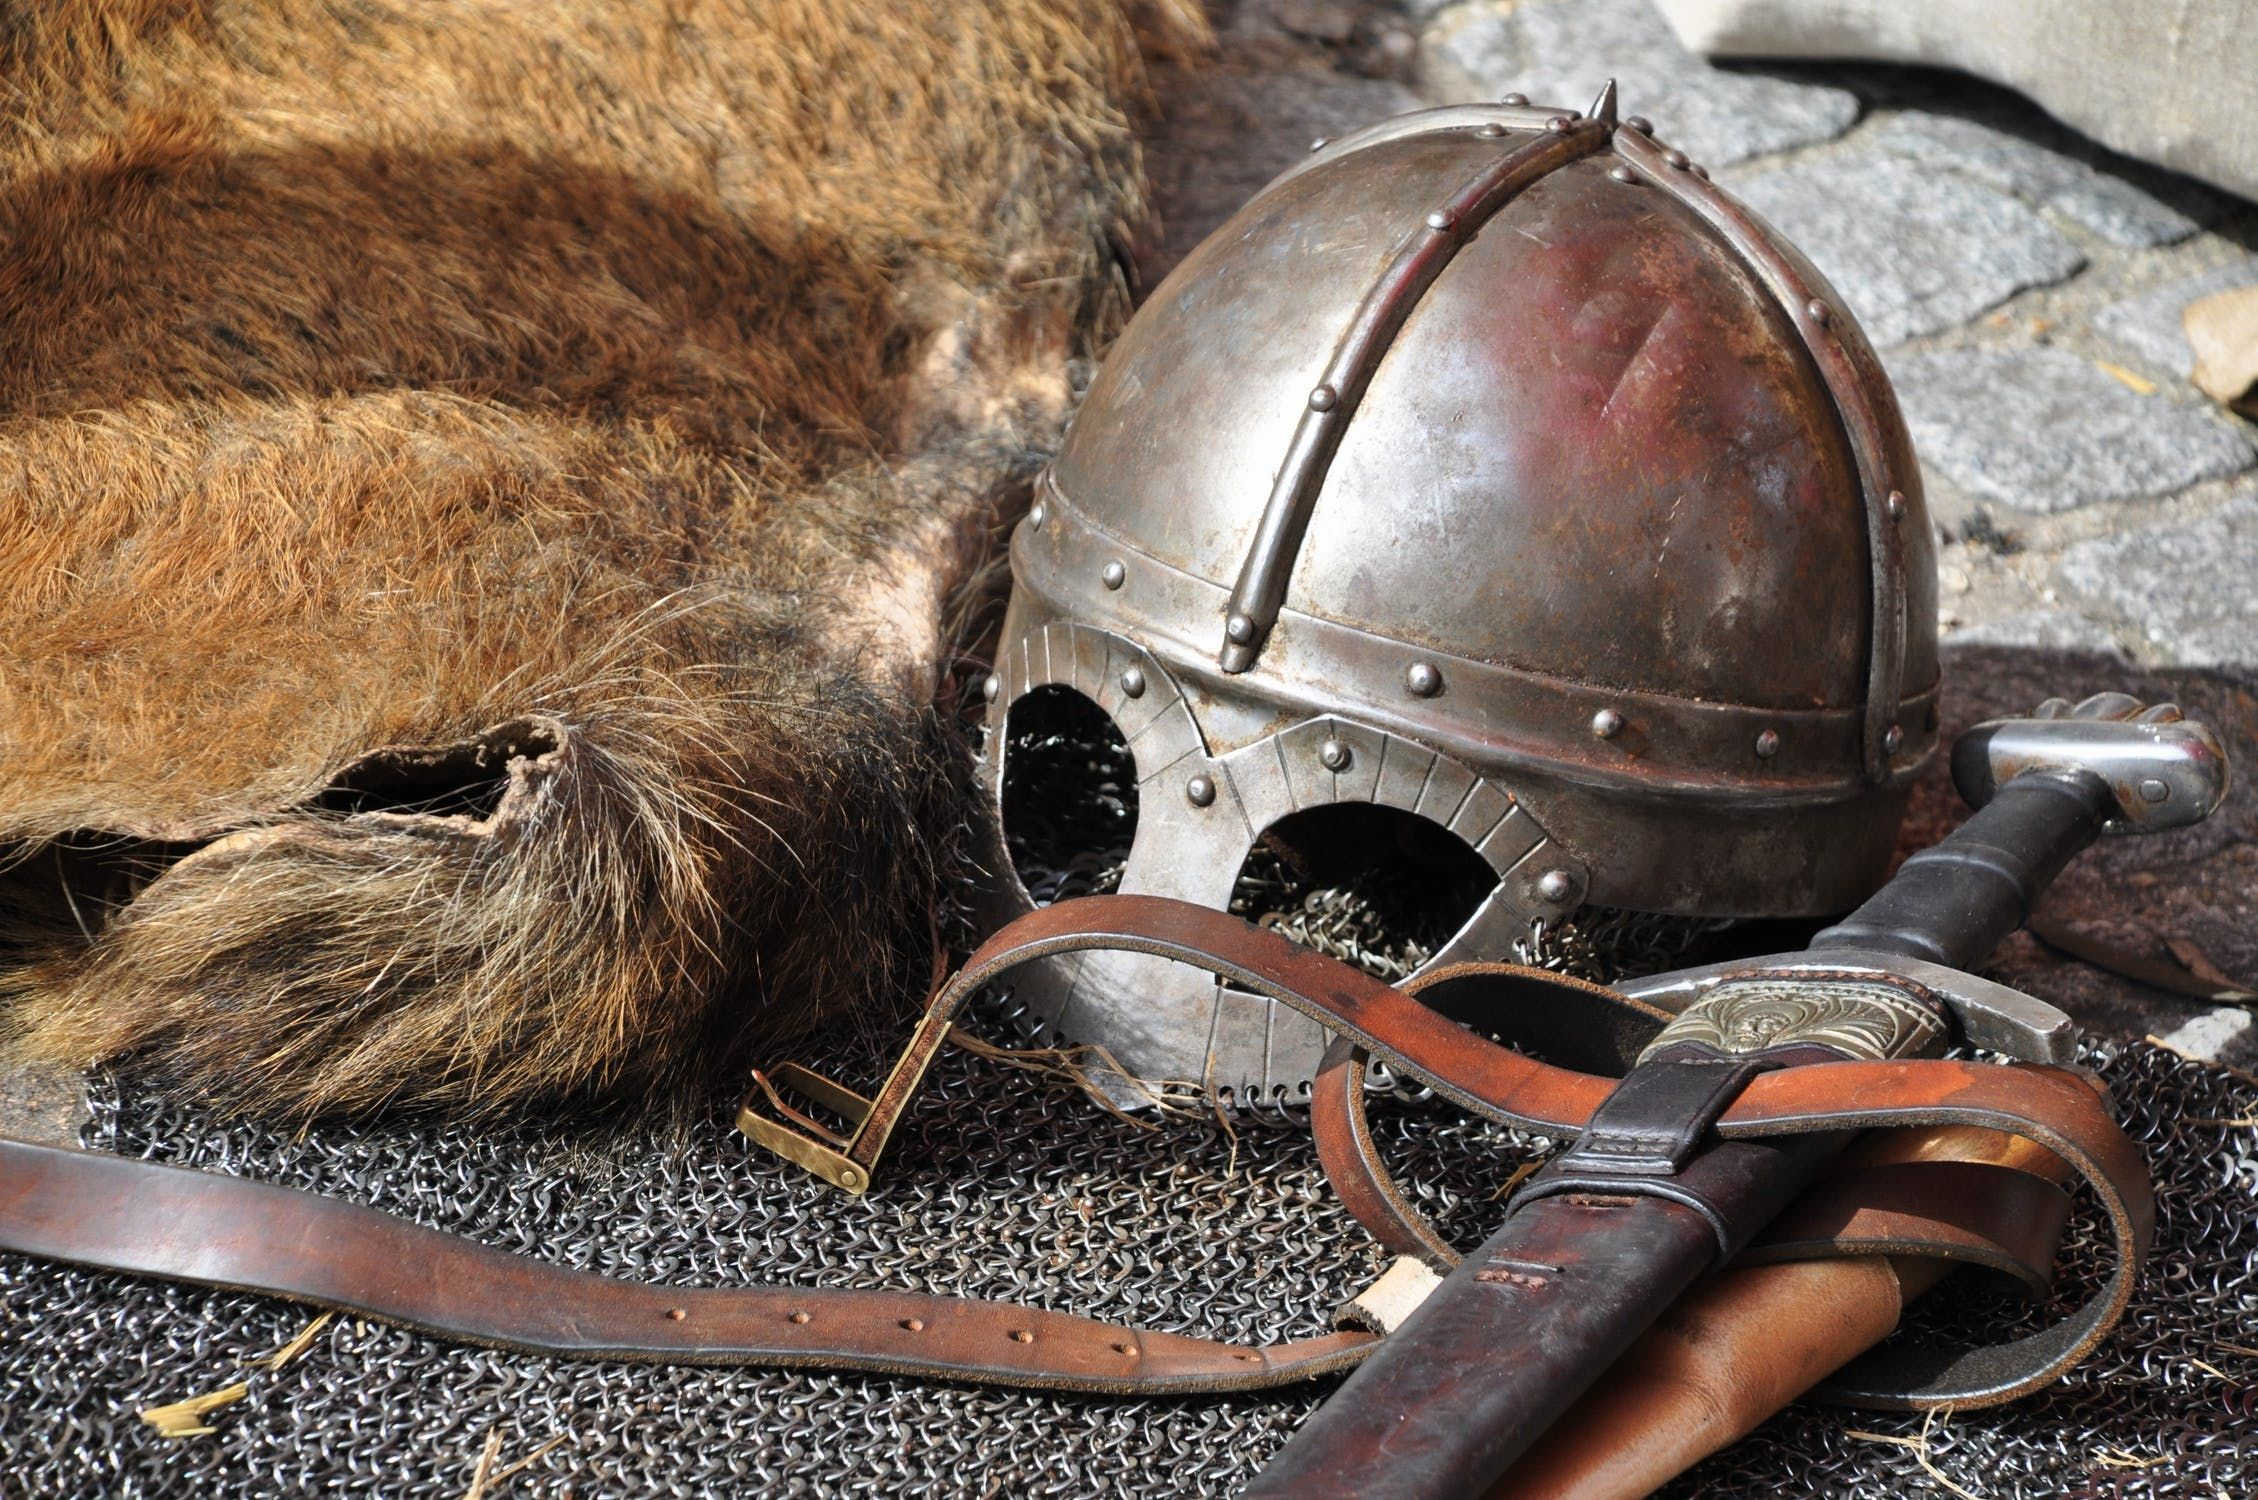 knight-armor-helmet-weapons-161936.jpe